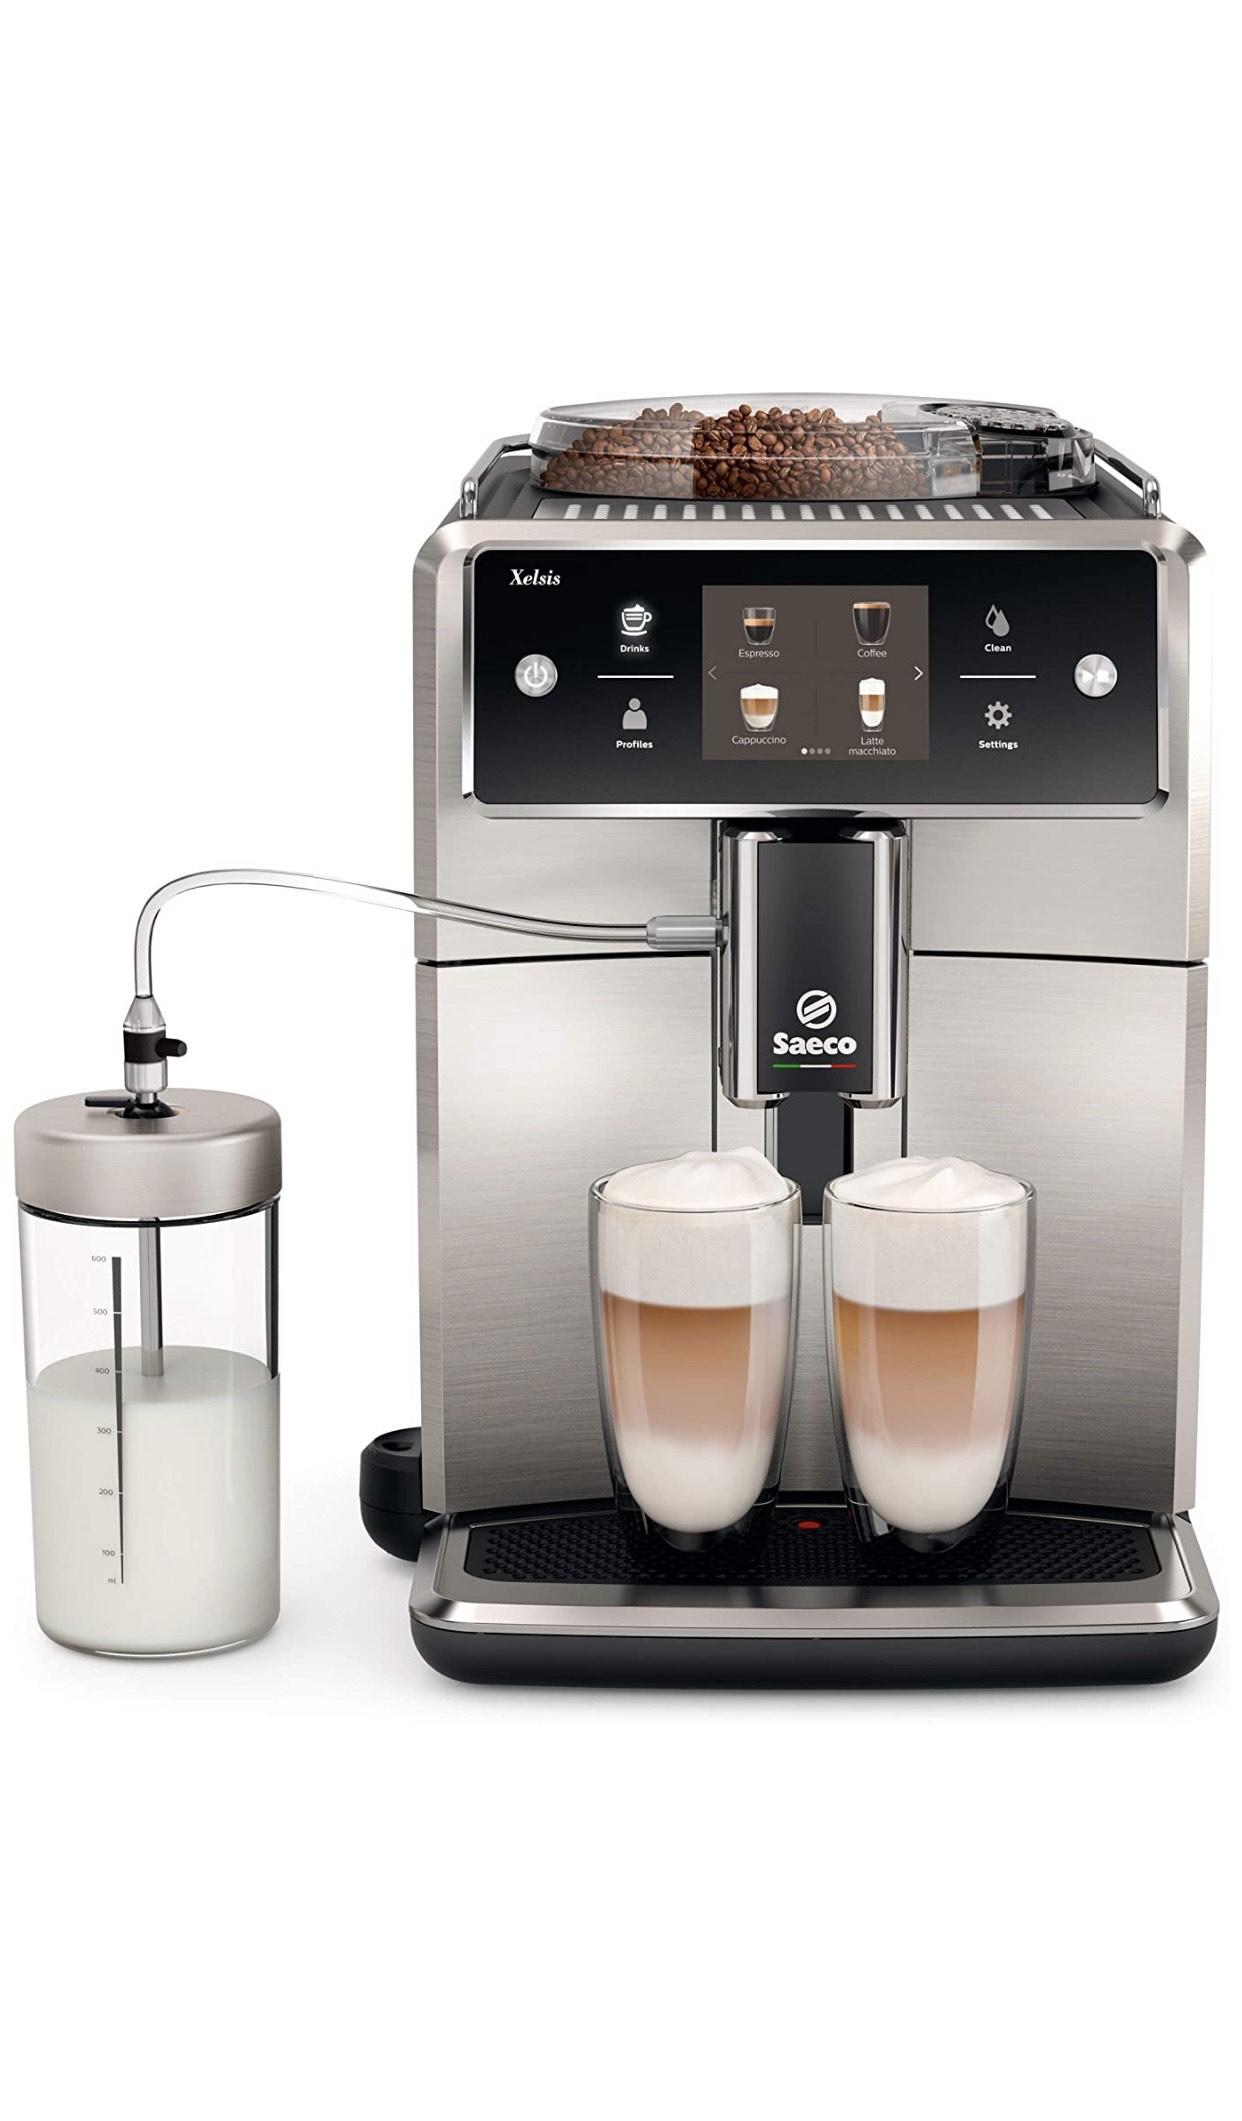 Saeco Xelsis SM7683/10 Kaffeevollautomat 15bar Schwarz/Edelstahl